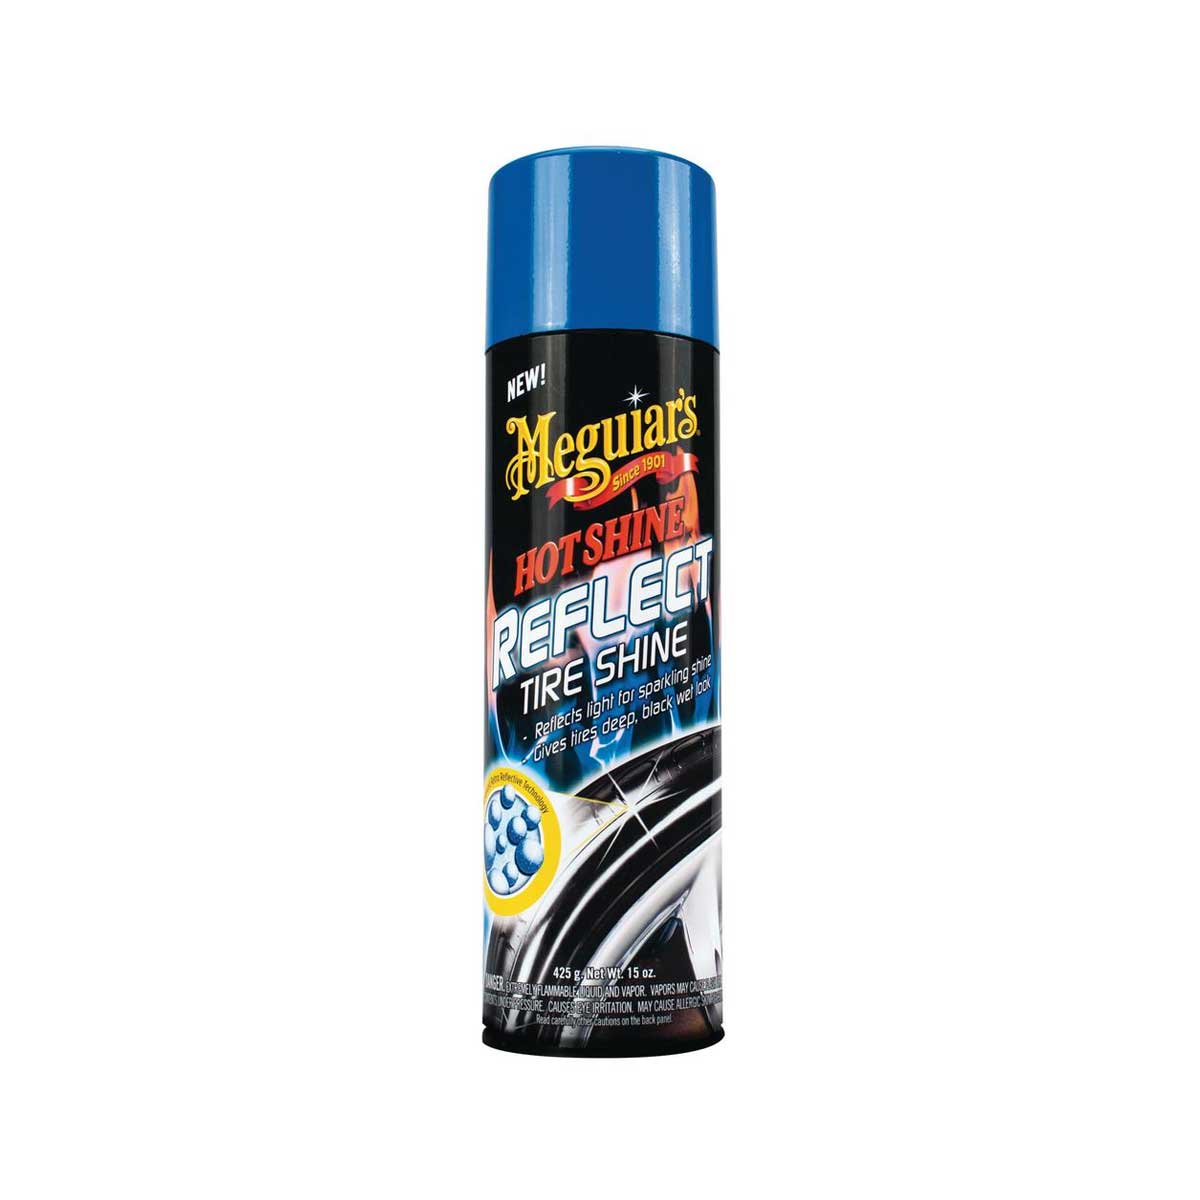 Däckglans Meguiars Hot Shine Reflect Tire Shine, 425 g